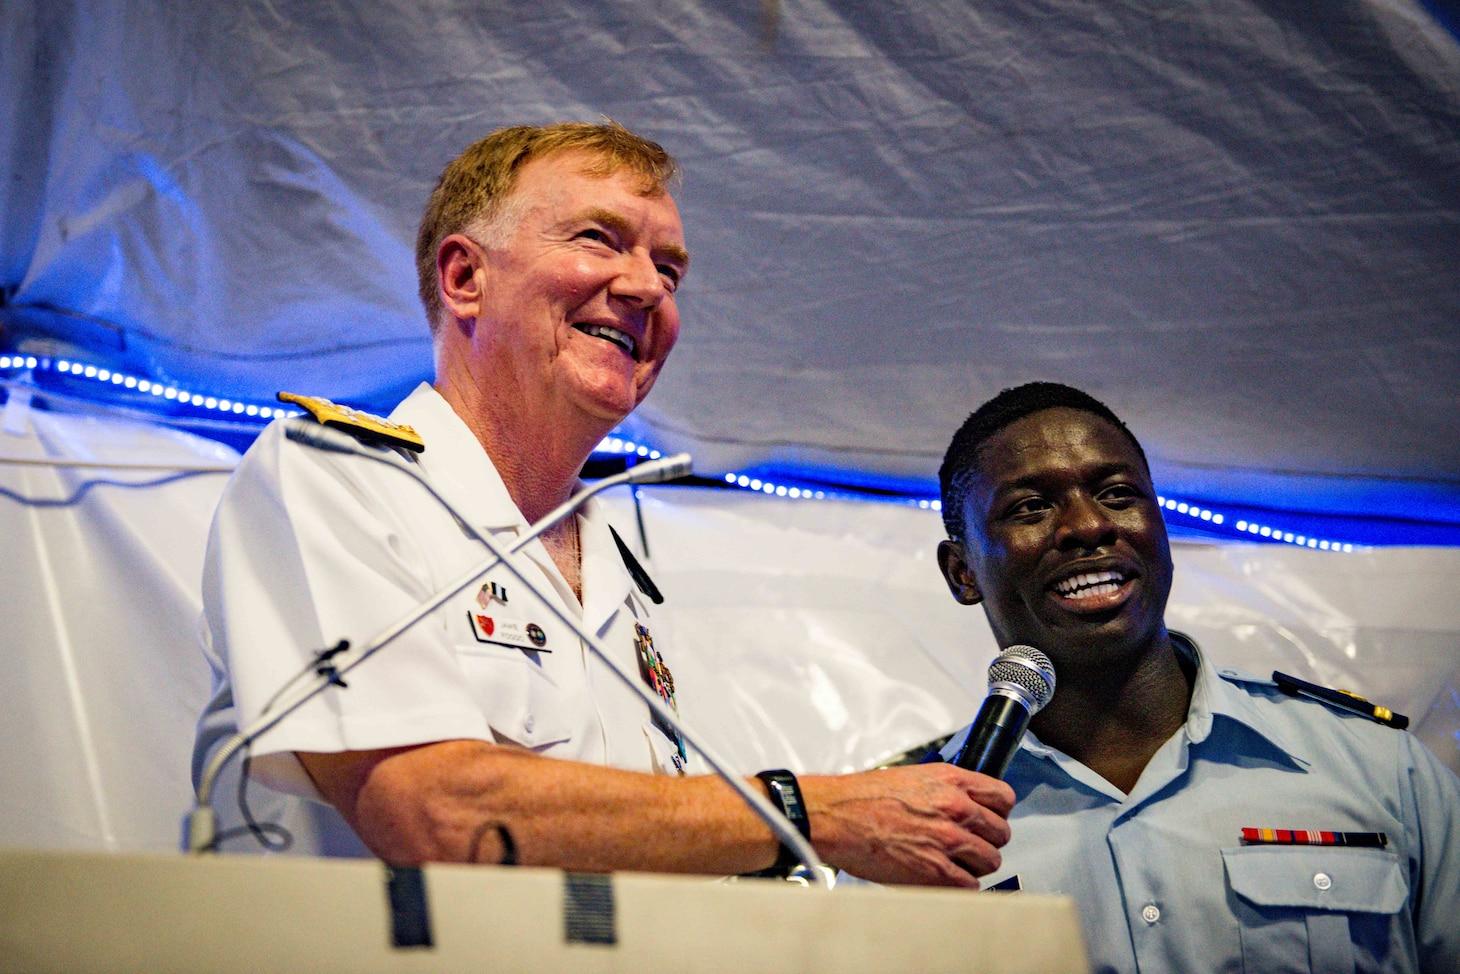 Adm. Foggo Visits Lagos, Nigeria